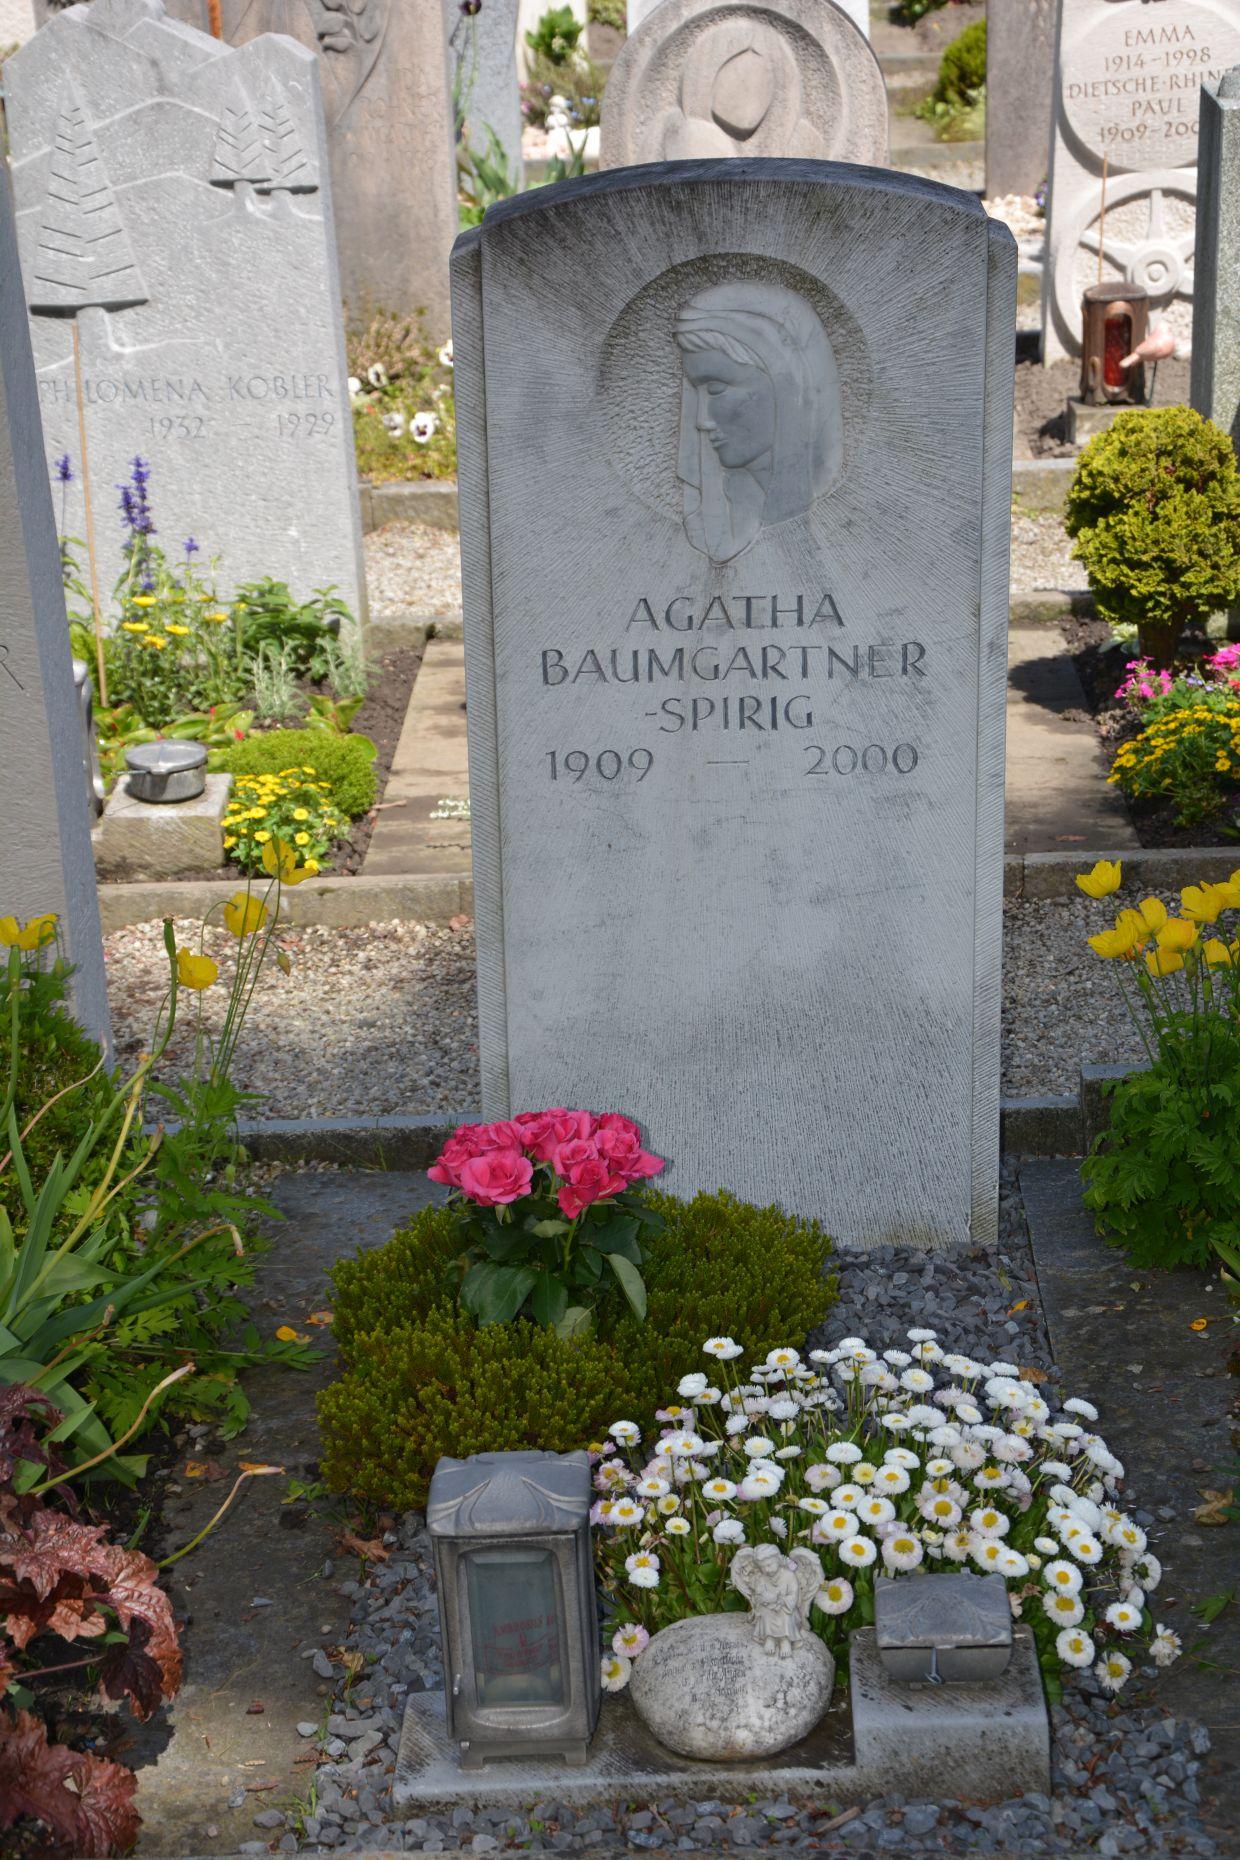 Agatha Baumgartner-Spirig 1909-2000